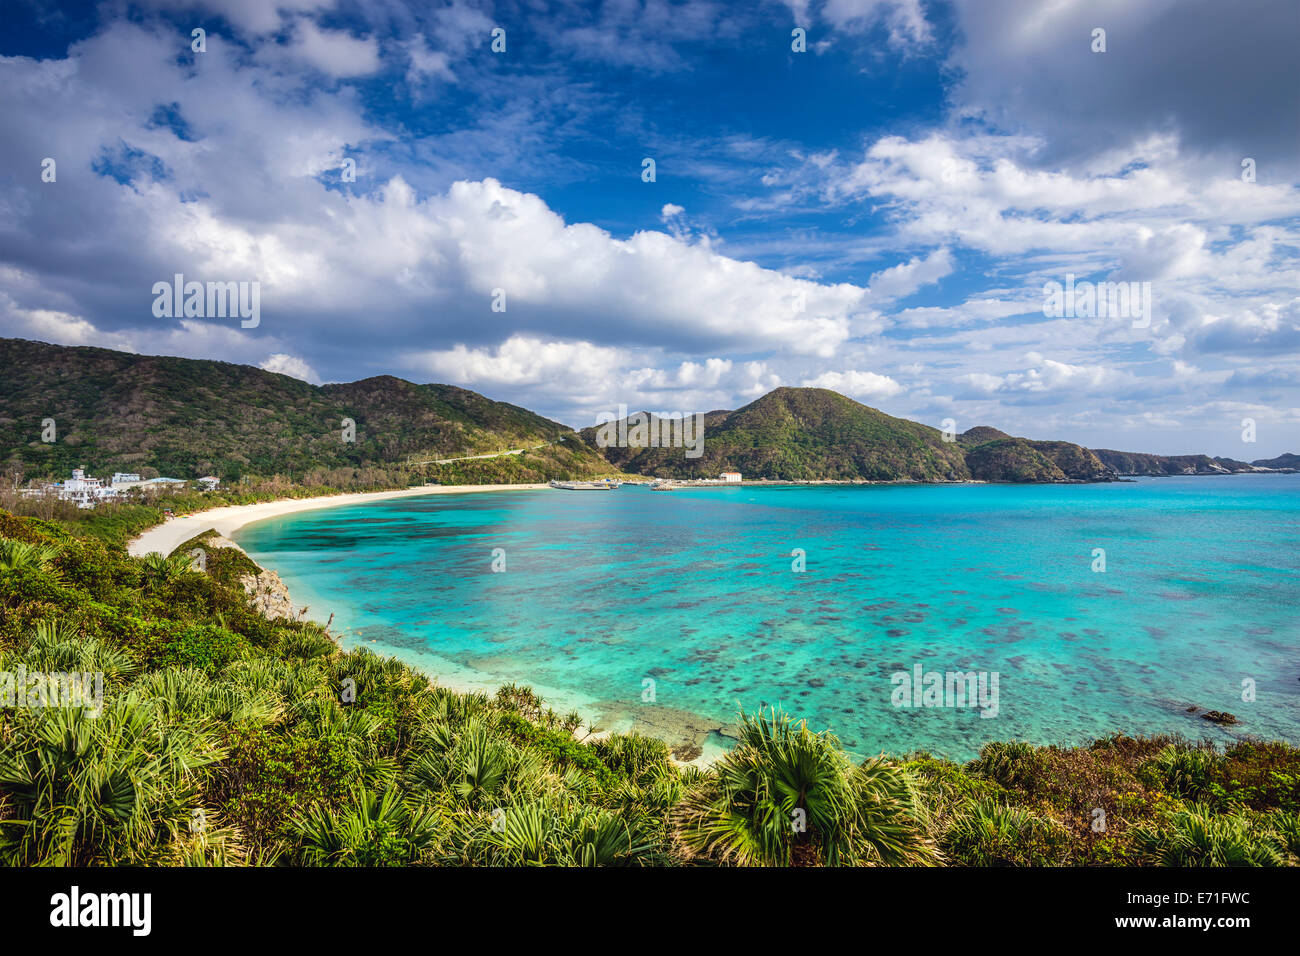 Aharen Beach on Tokashiki Island in Okinawa, Japan. - Stock Image